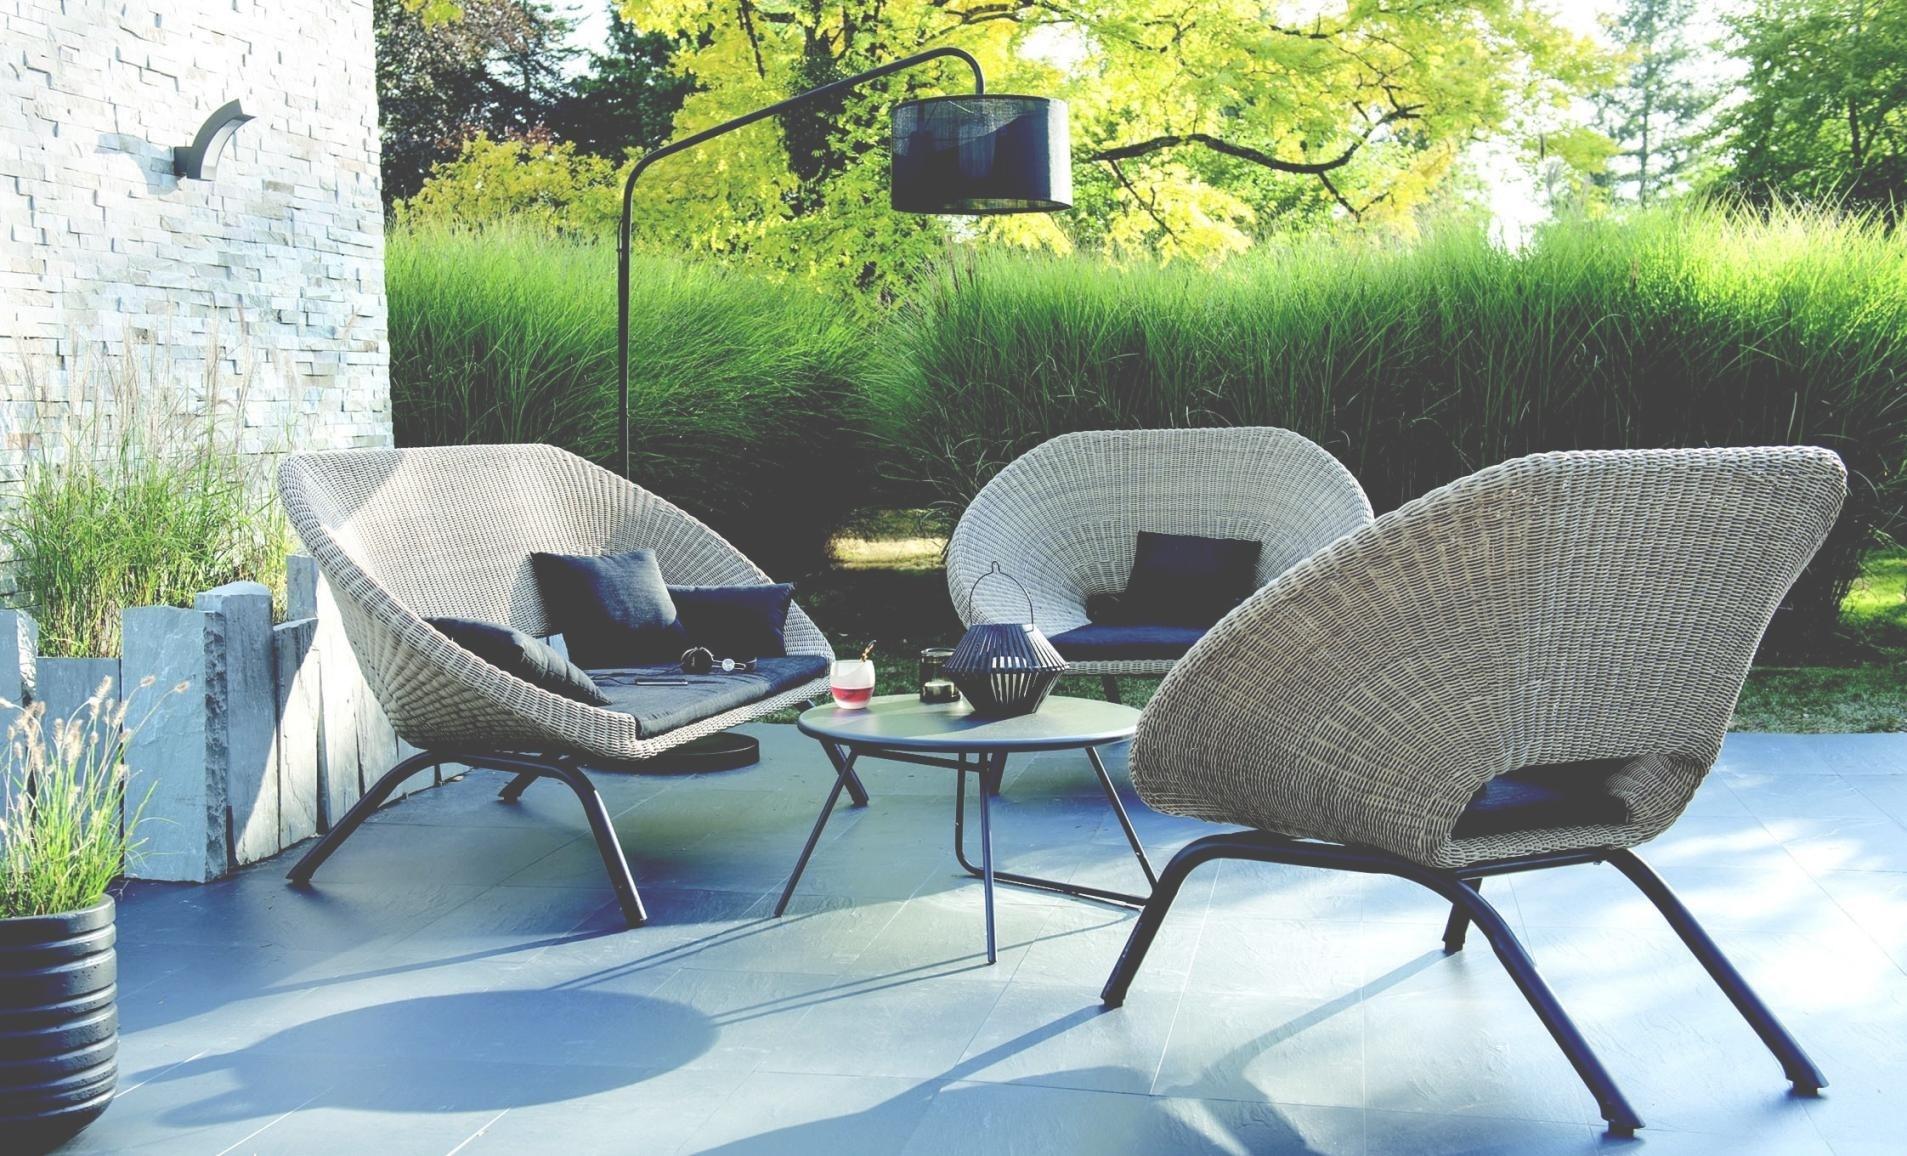 Location salon de jardin nantes - Mailleraye.fr jardin